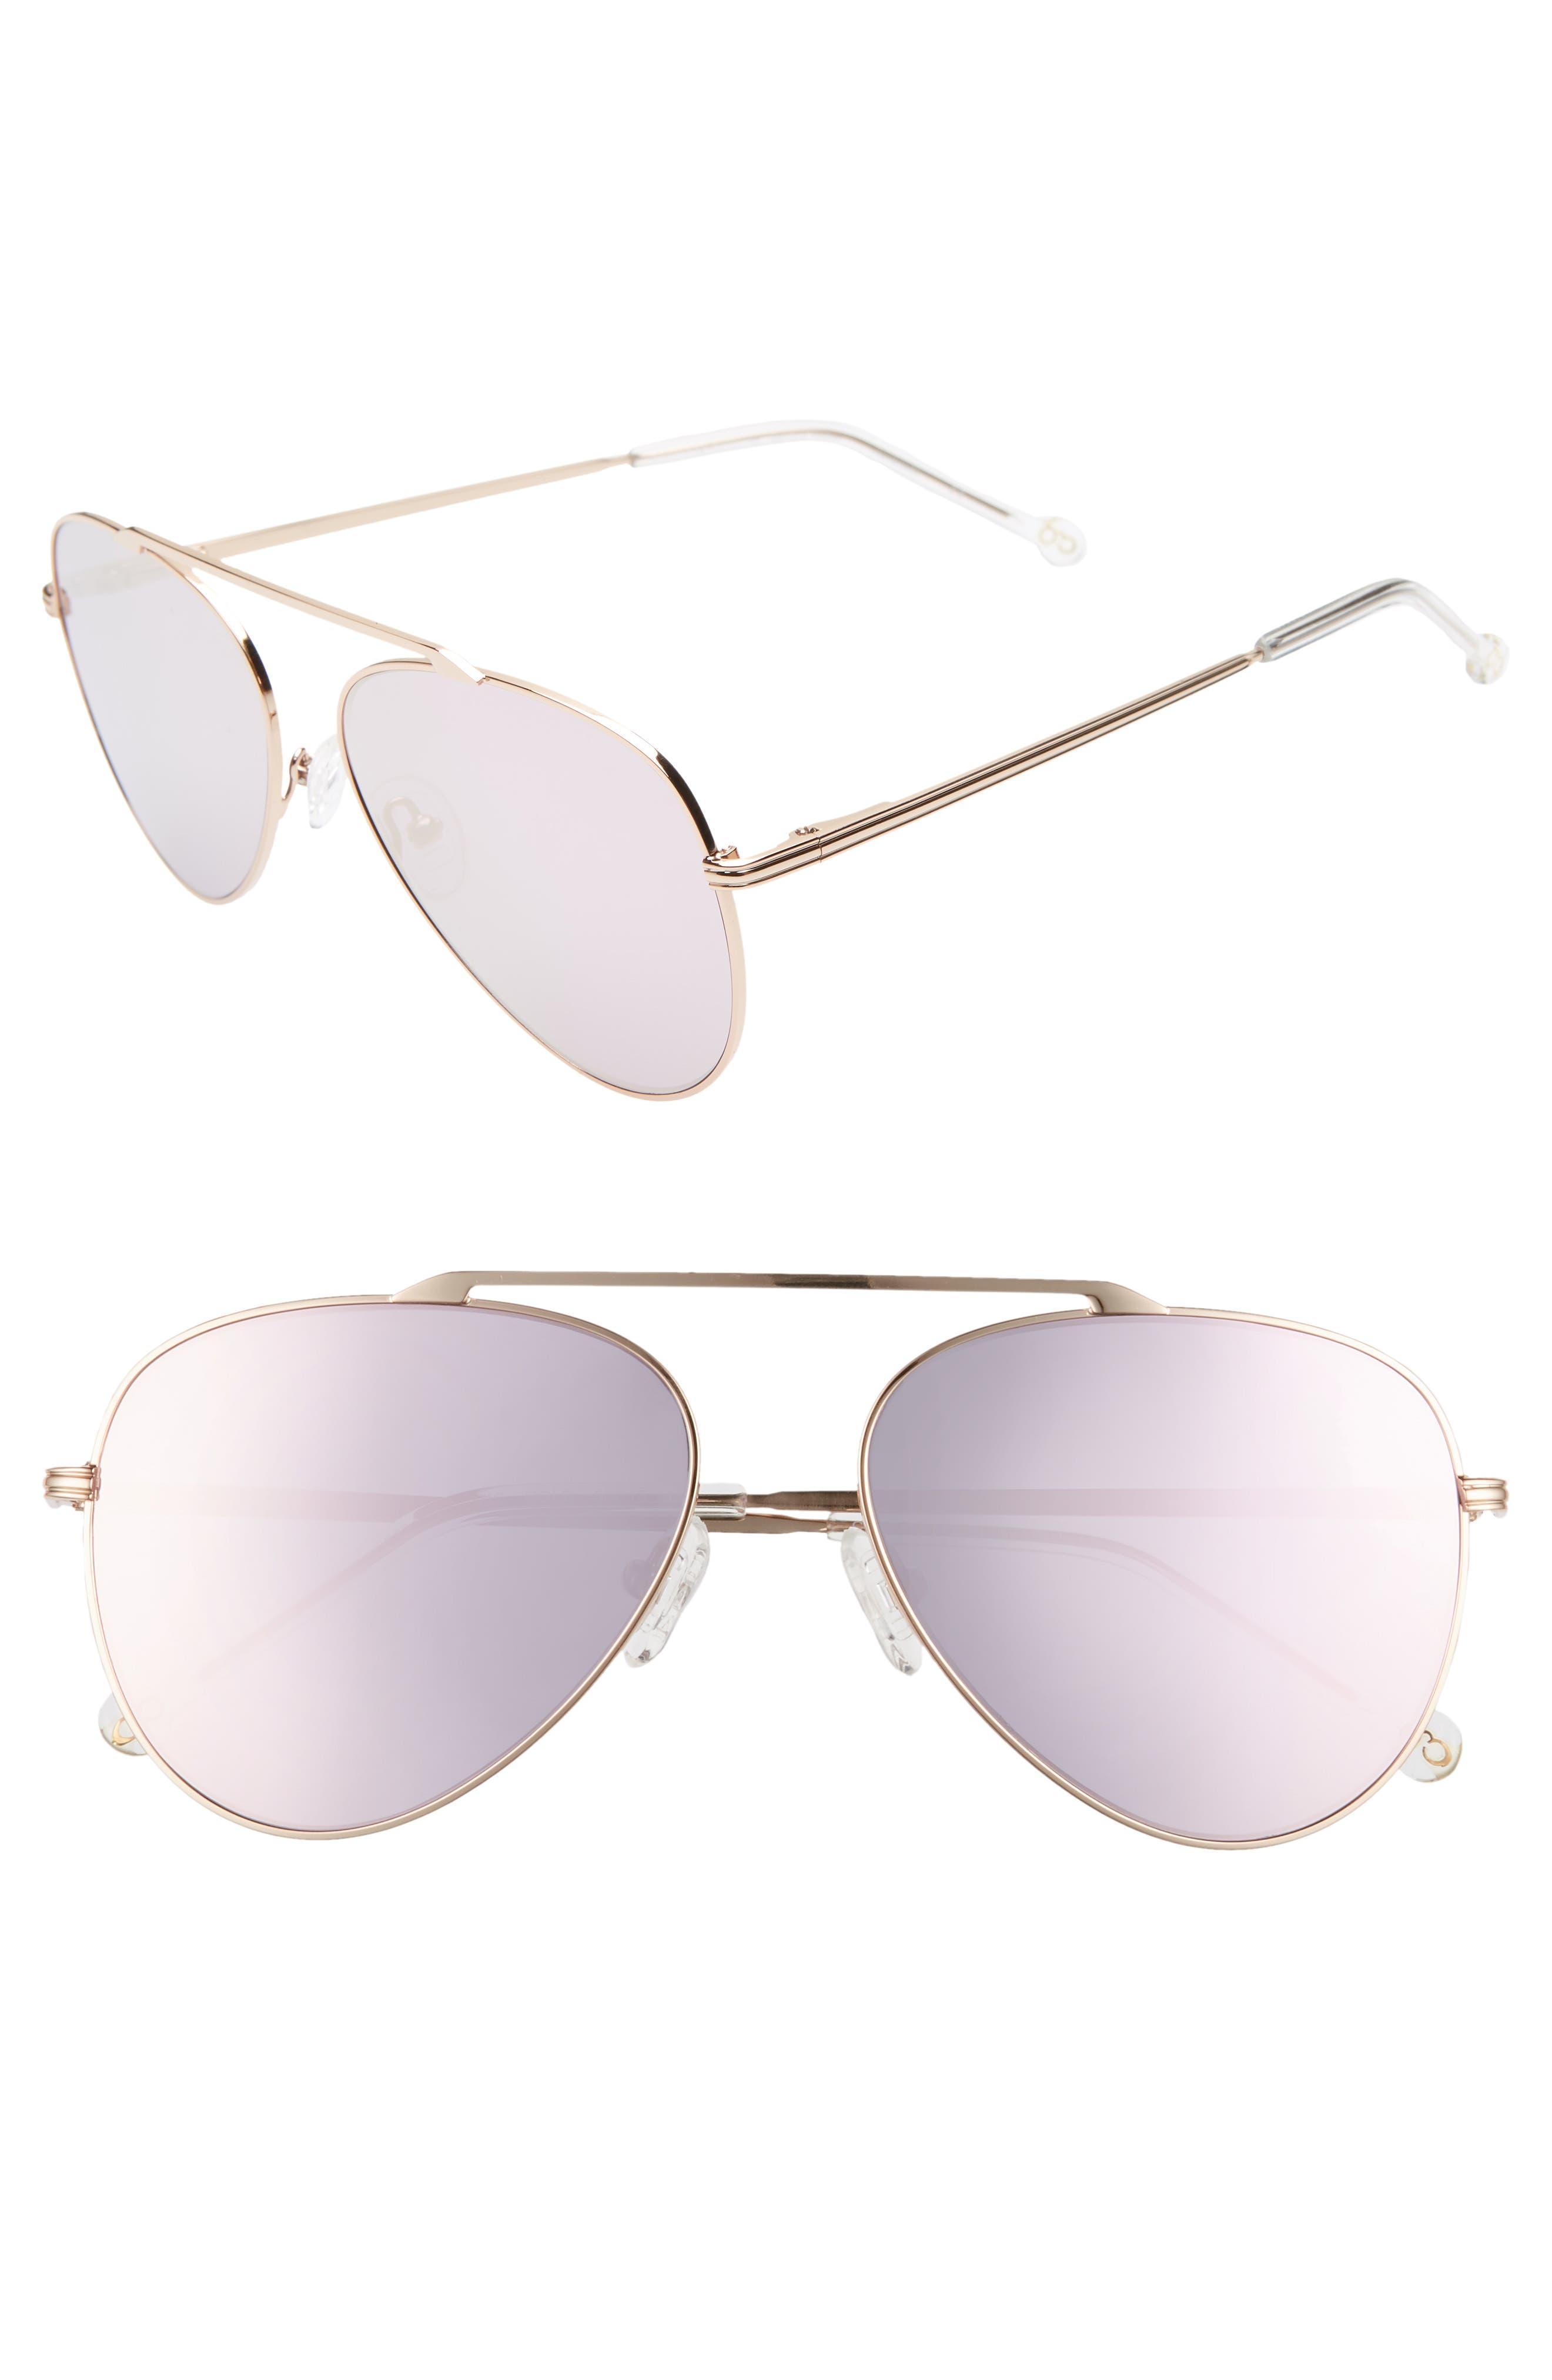 Cosmic 58mm Aviator Sunglasses, Main, color, ROSE GOLD